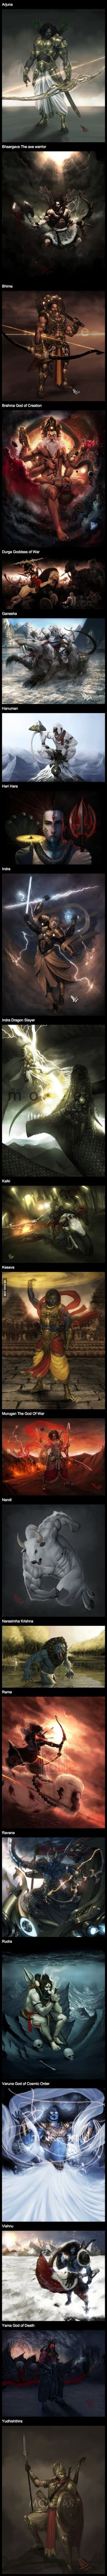 Illustrations of Indian Gods